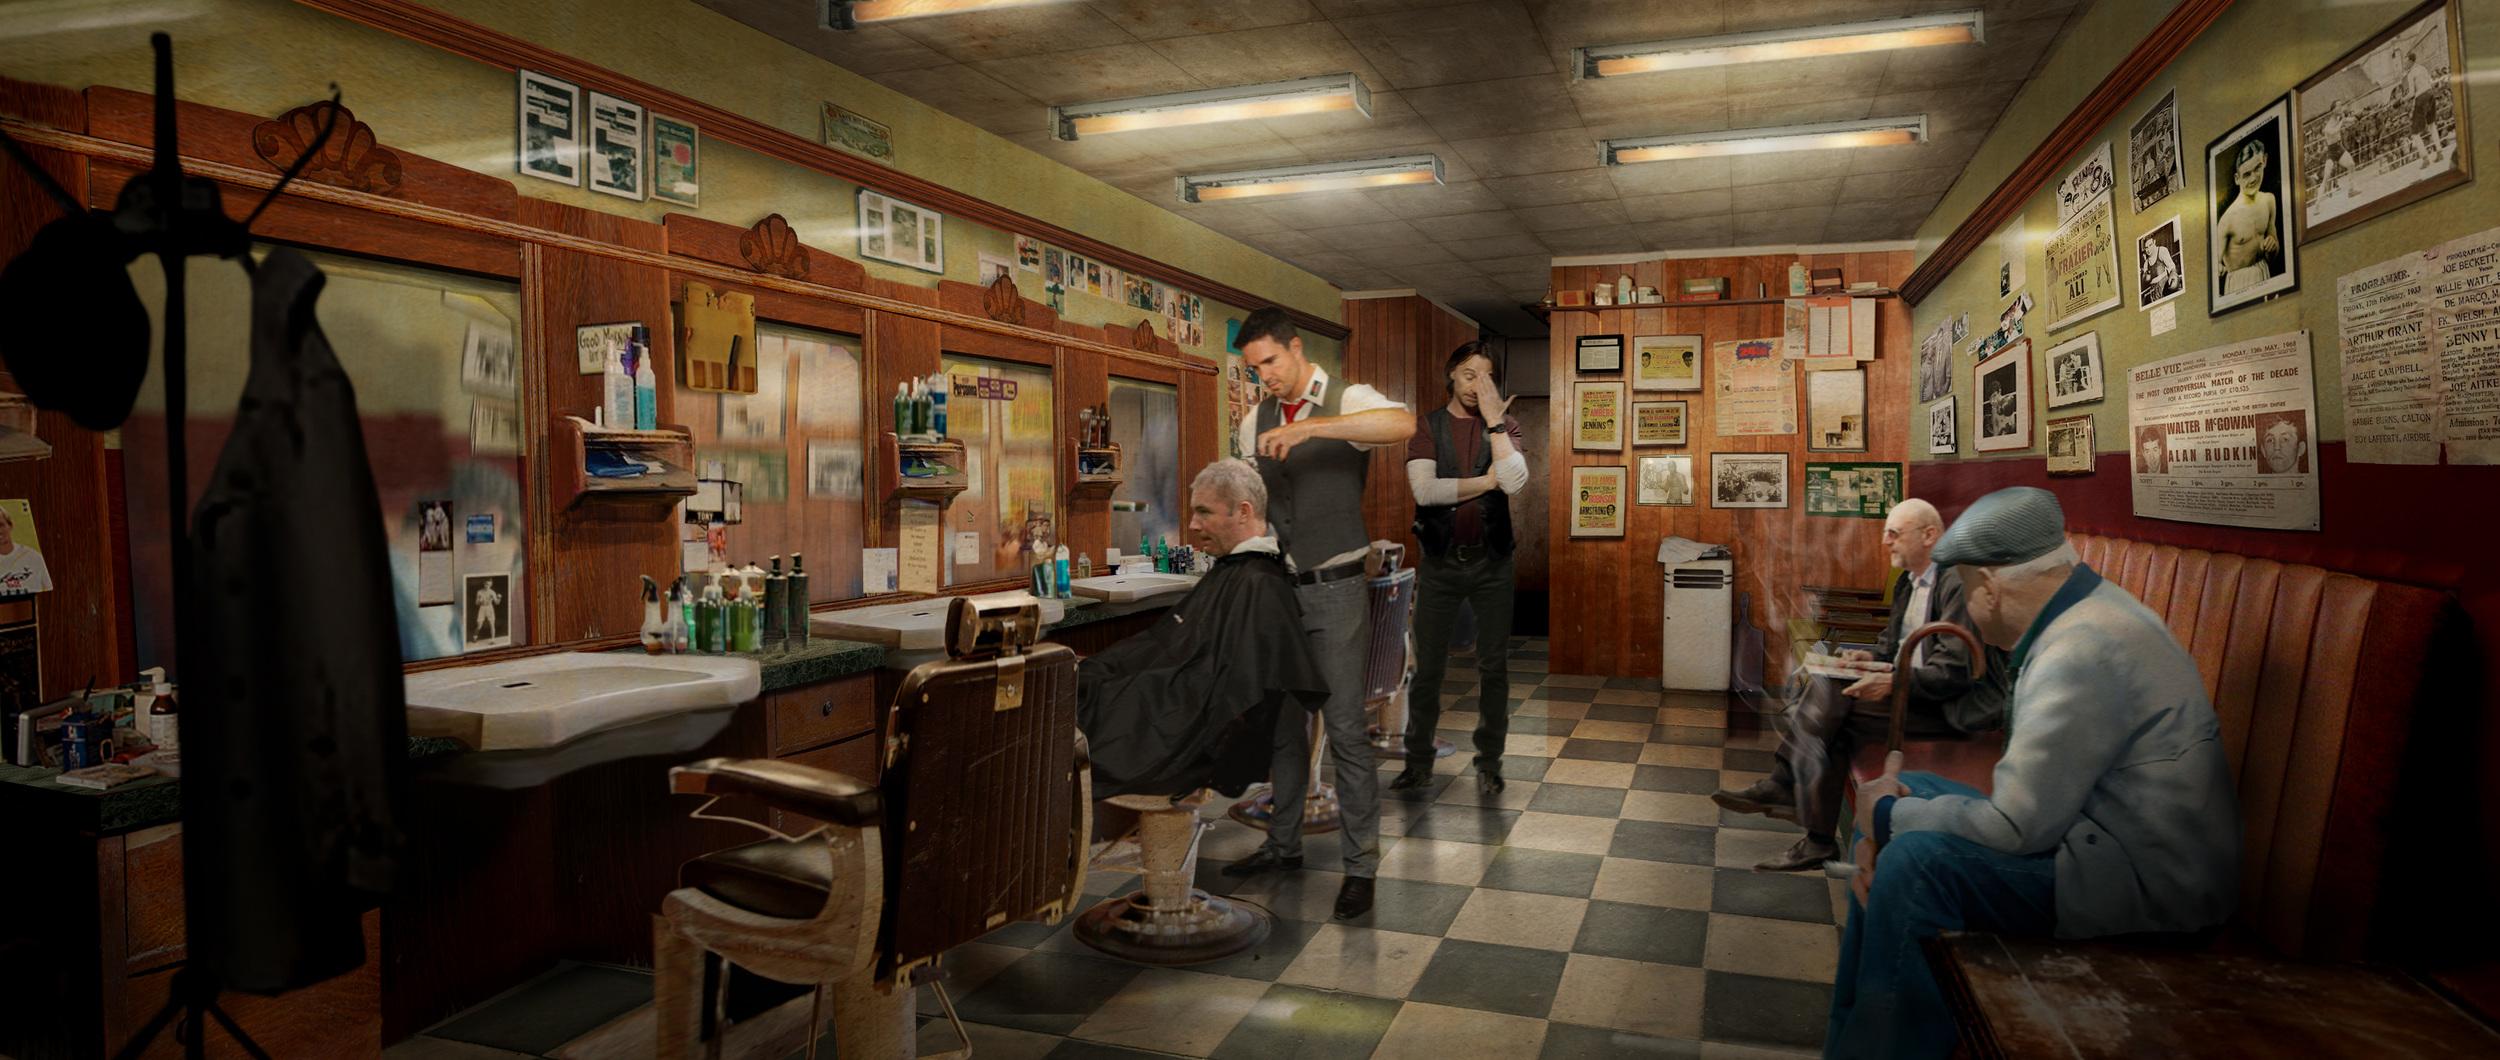 Barbershop_140125_V4.jpg